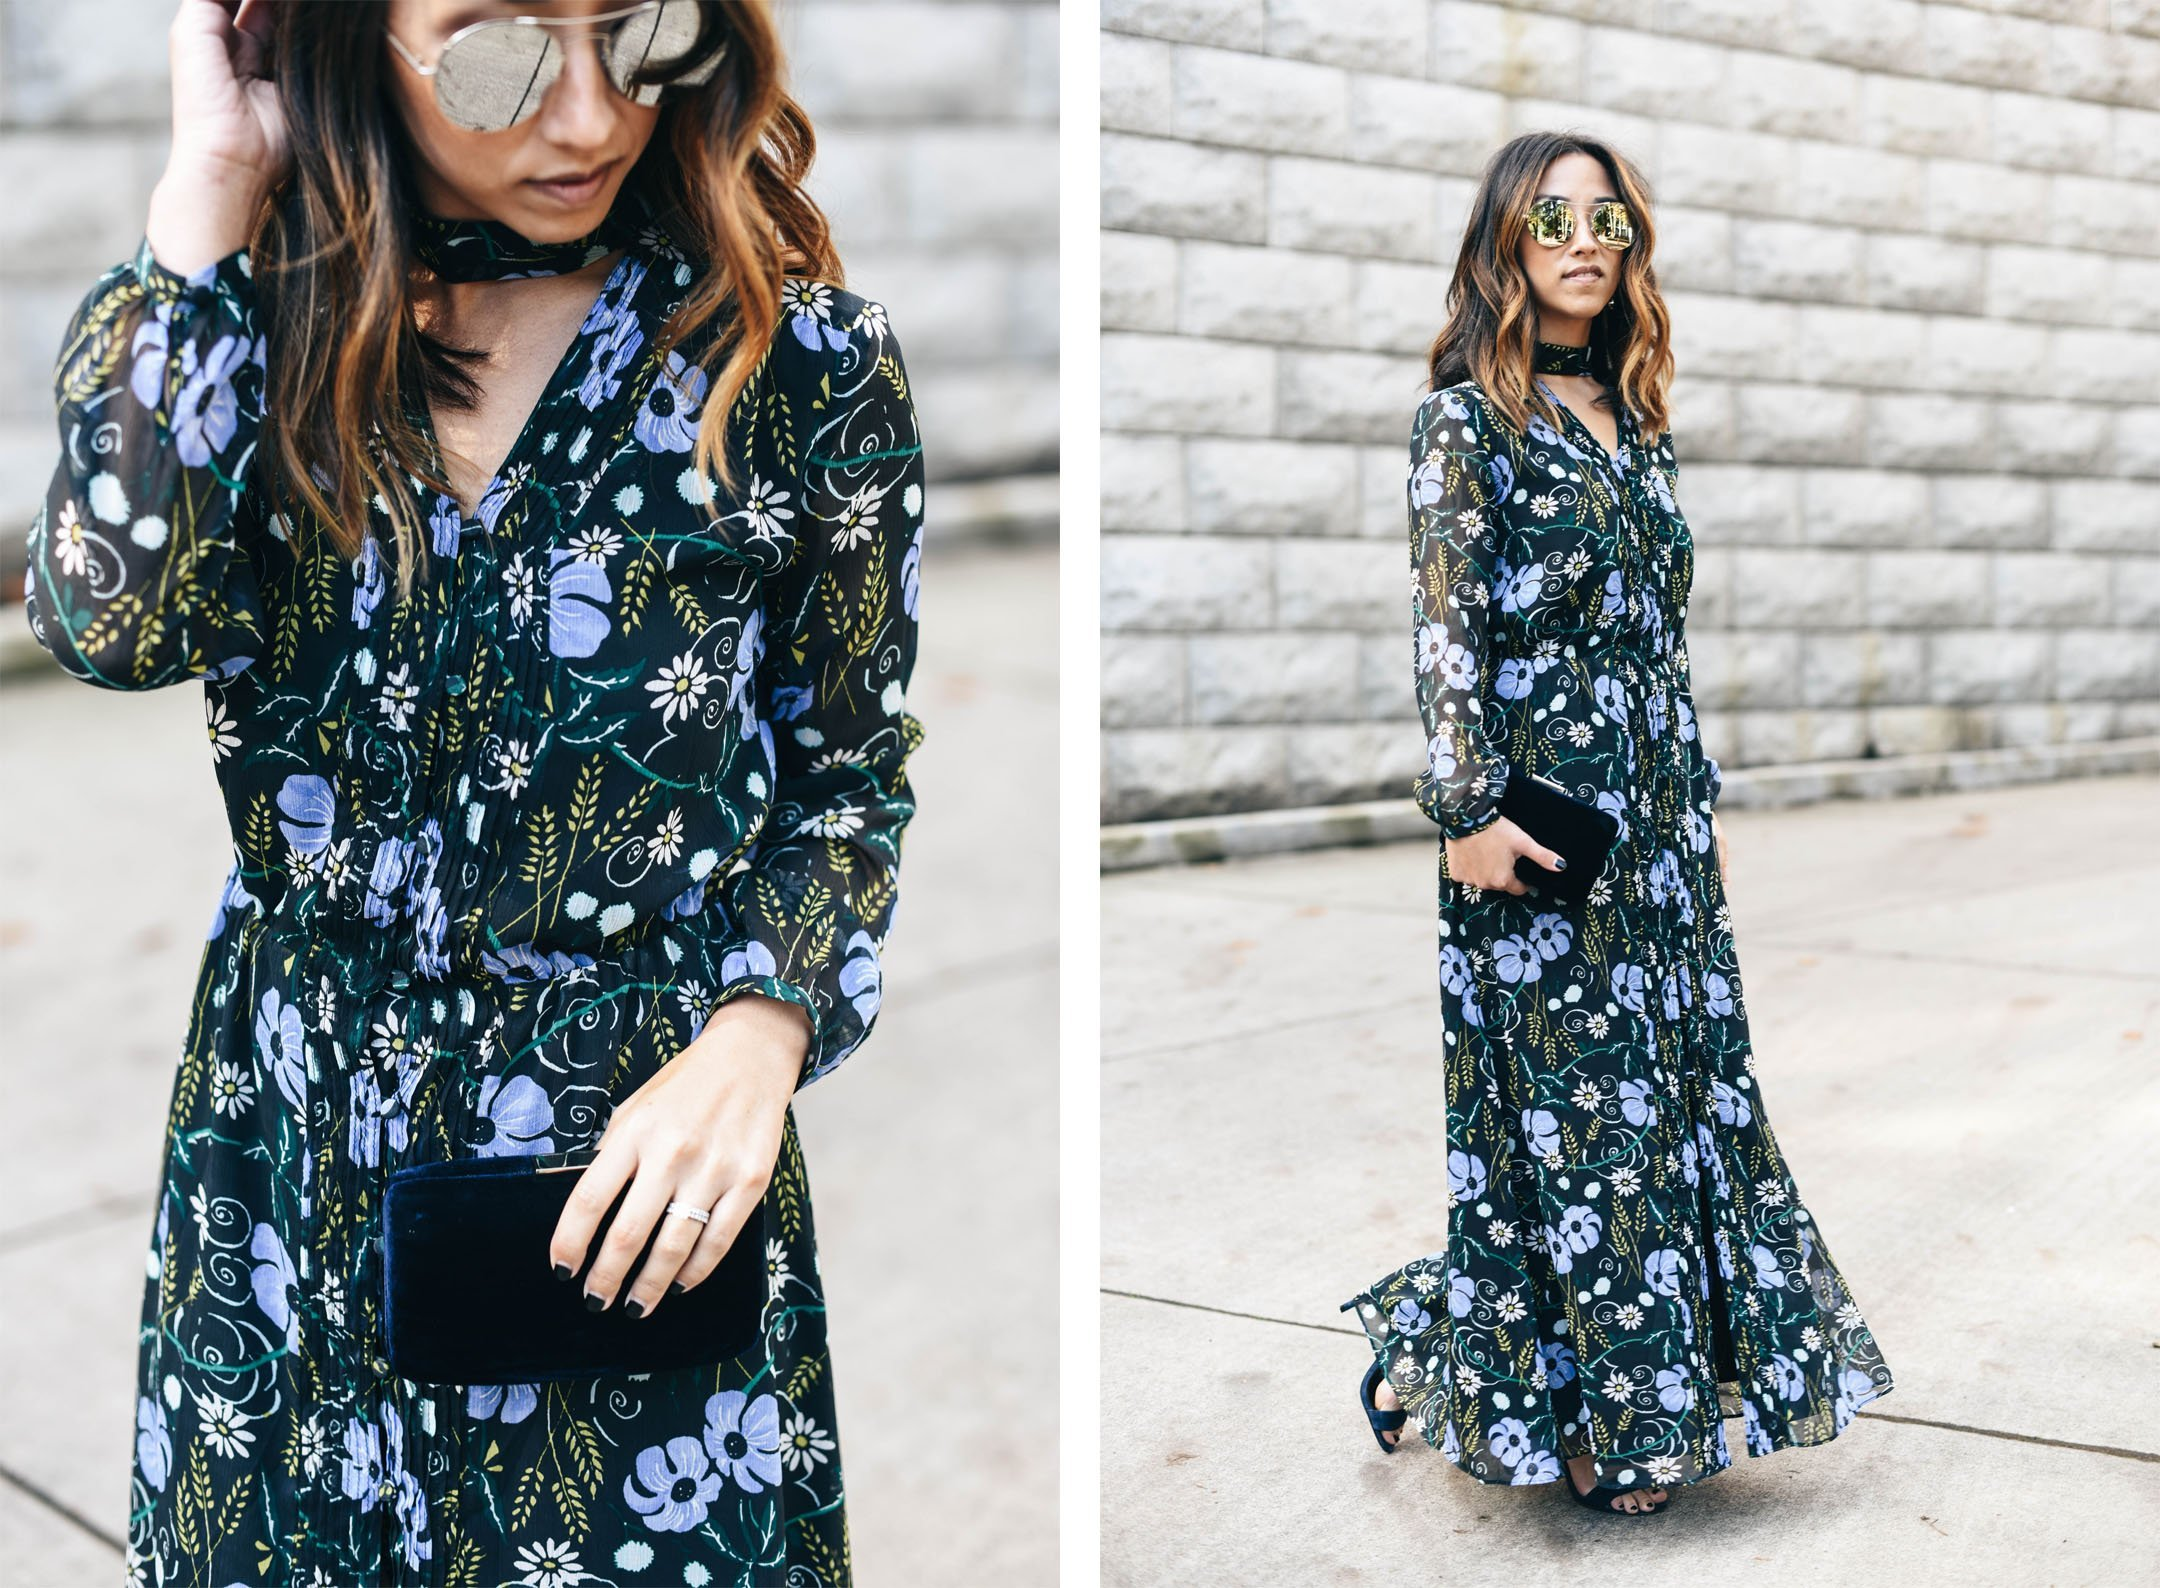 crystalin-marie-wearing-banana-republic-floral-maxi-dress